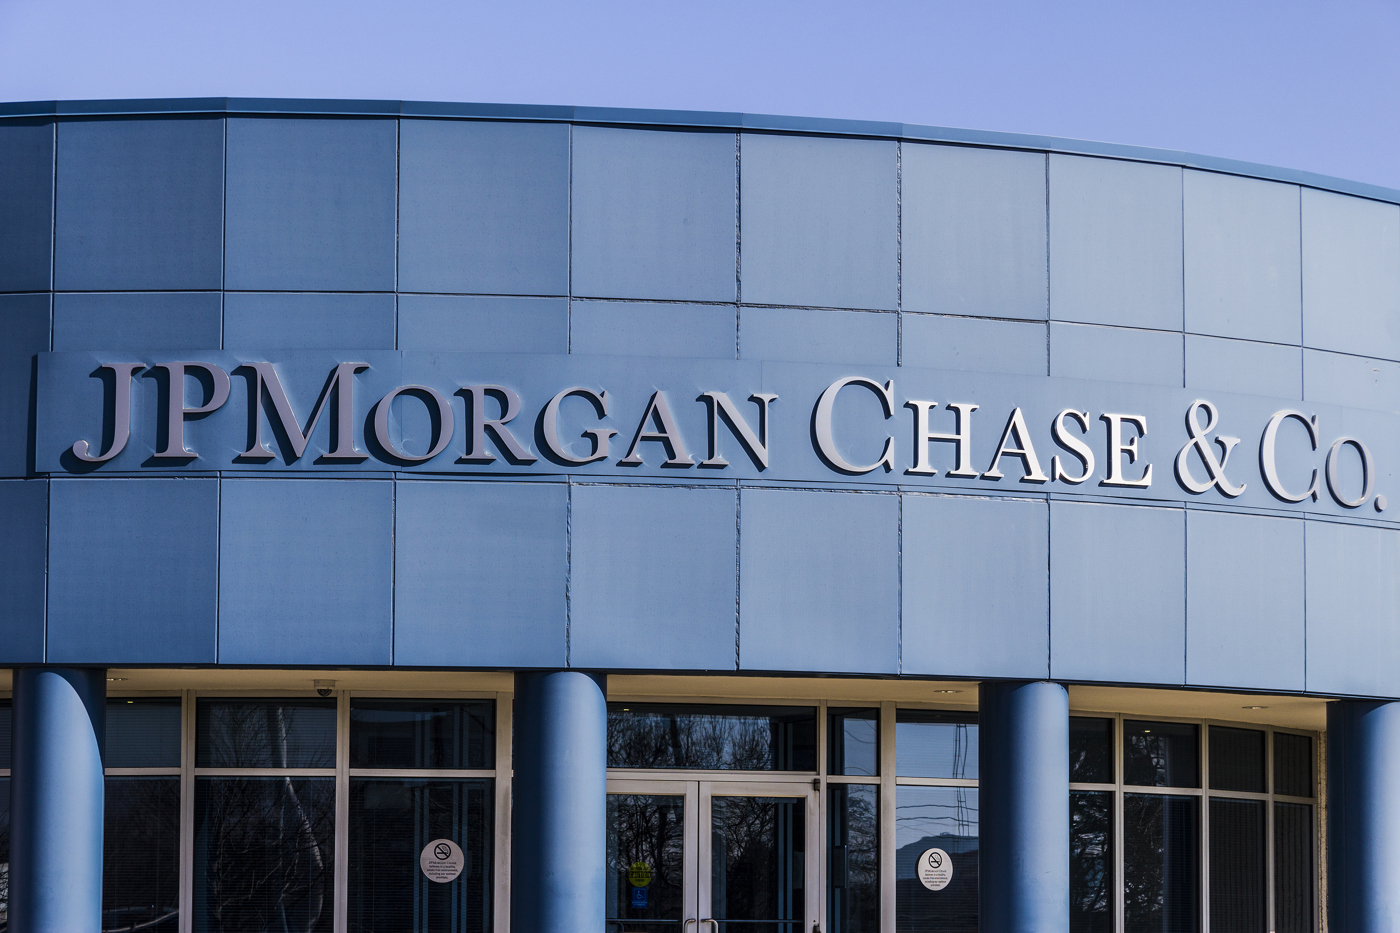 JPMorgan Chase JPM stock news and analysis